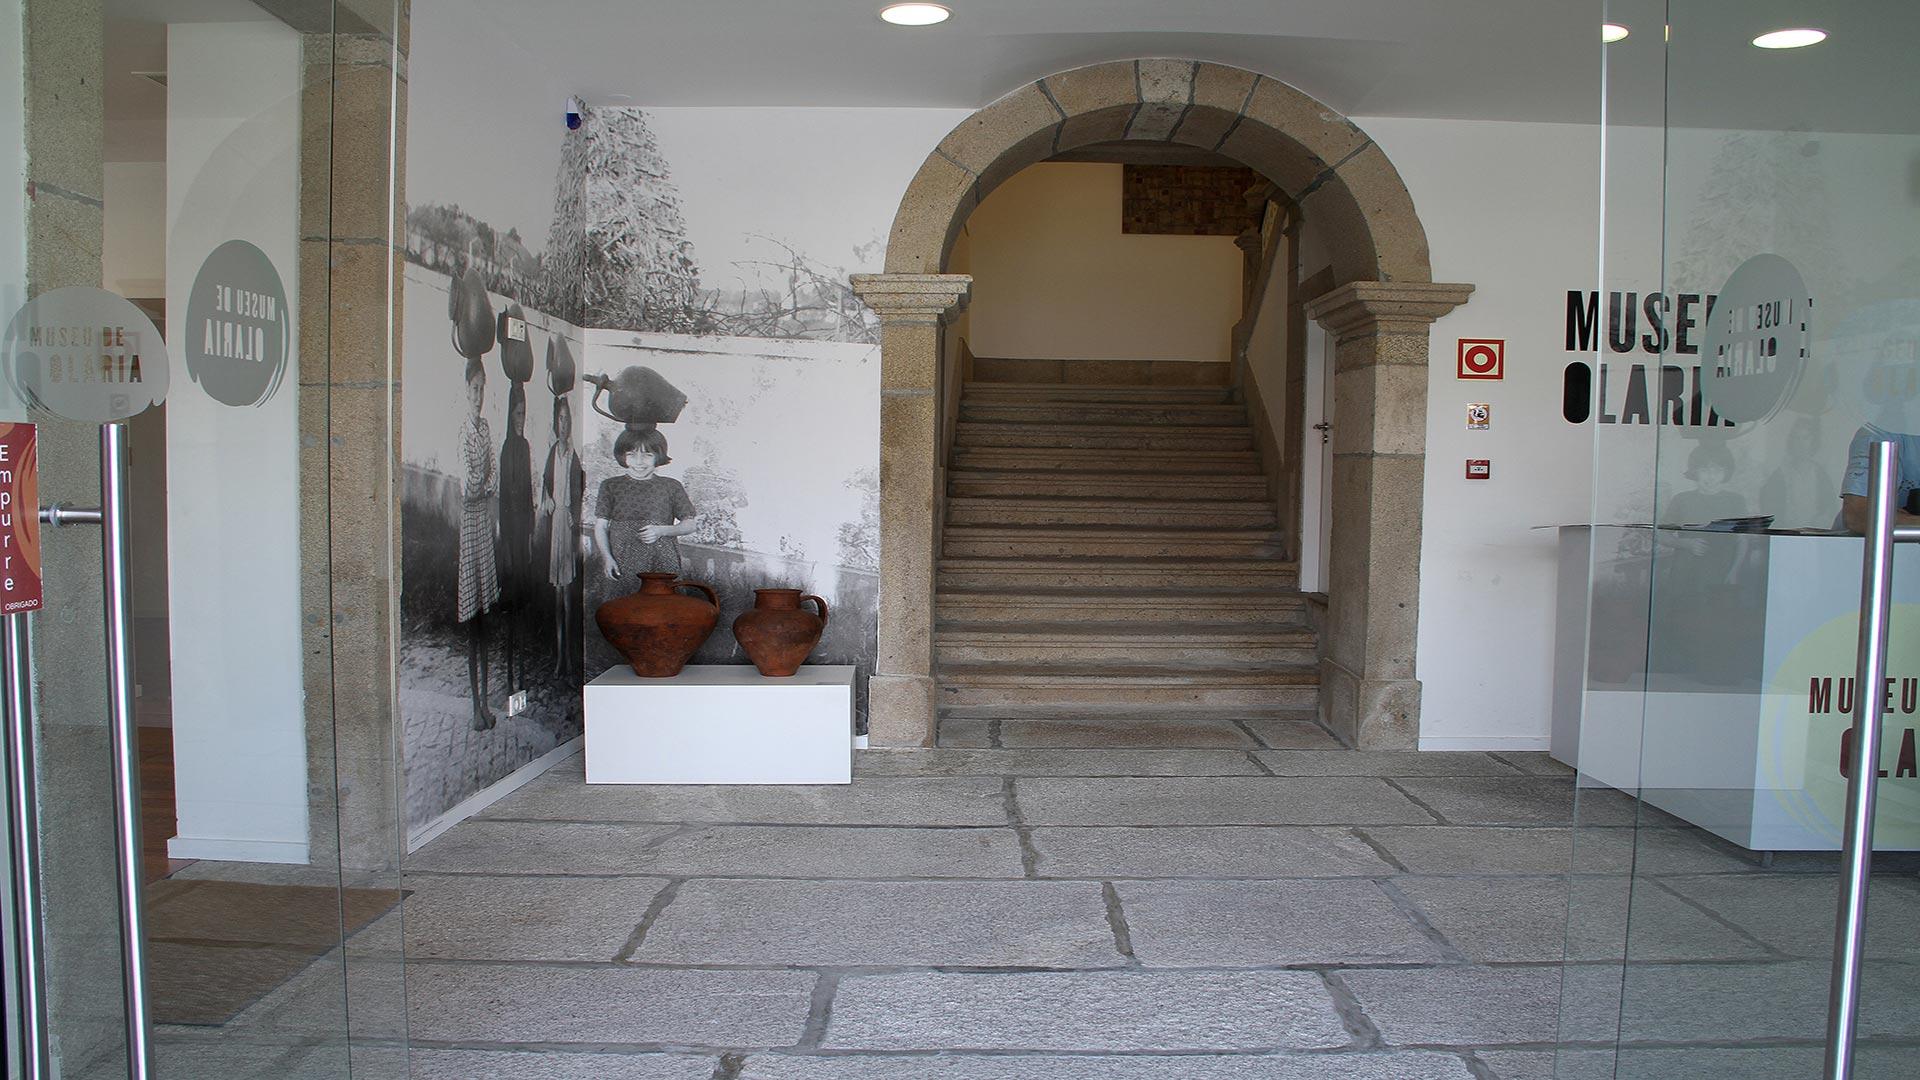 museuolaria_espacos